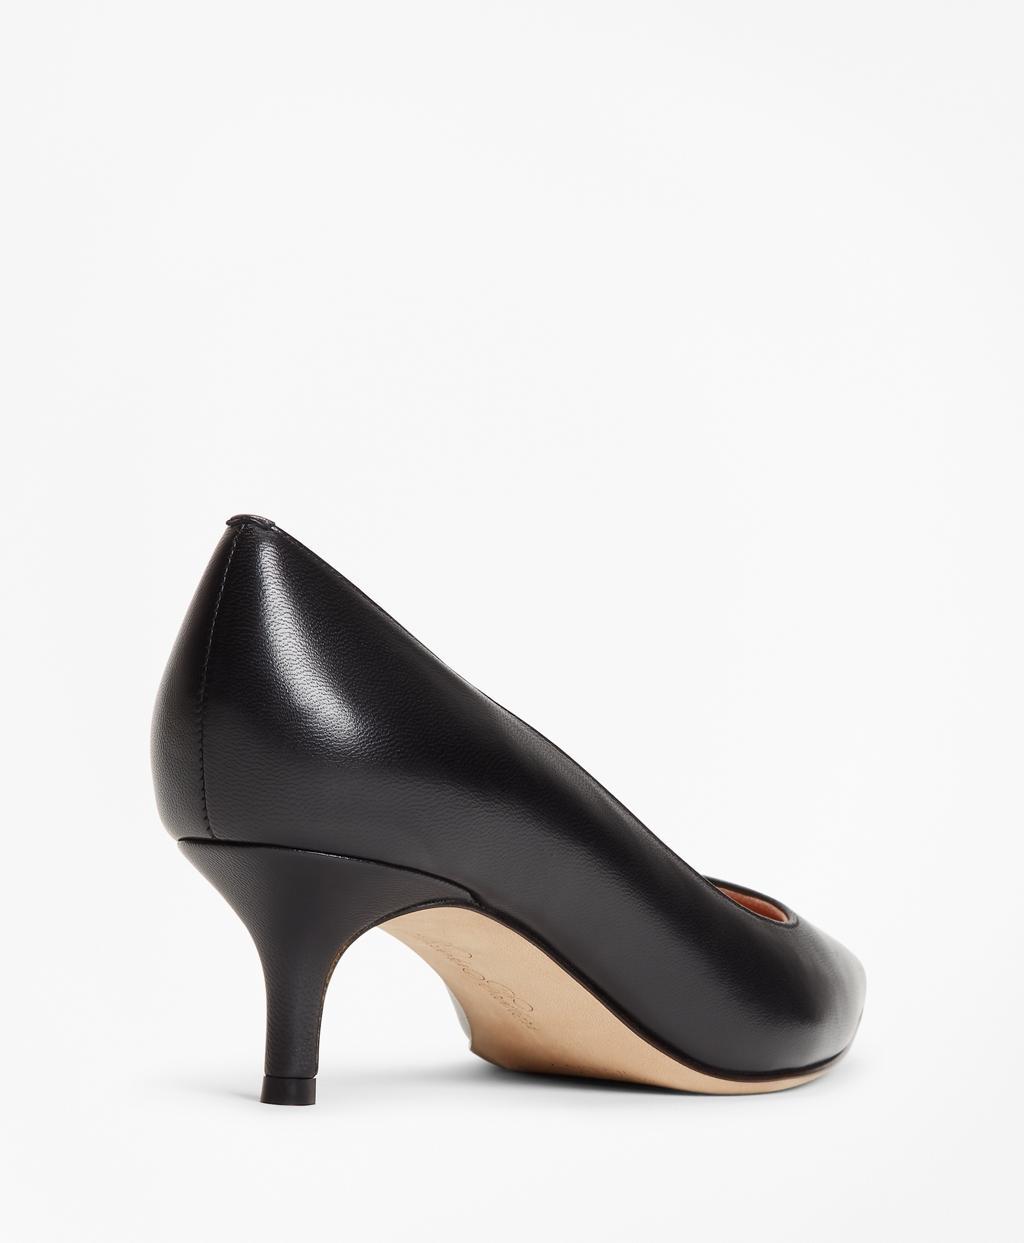 b8aaa0506ae Lyst - Brooks Brothers Leather Point-toe Kitten Heels in Black